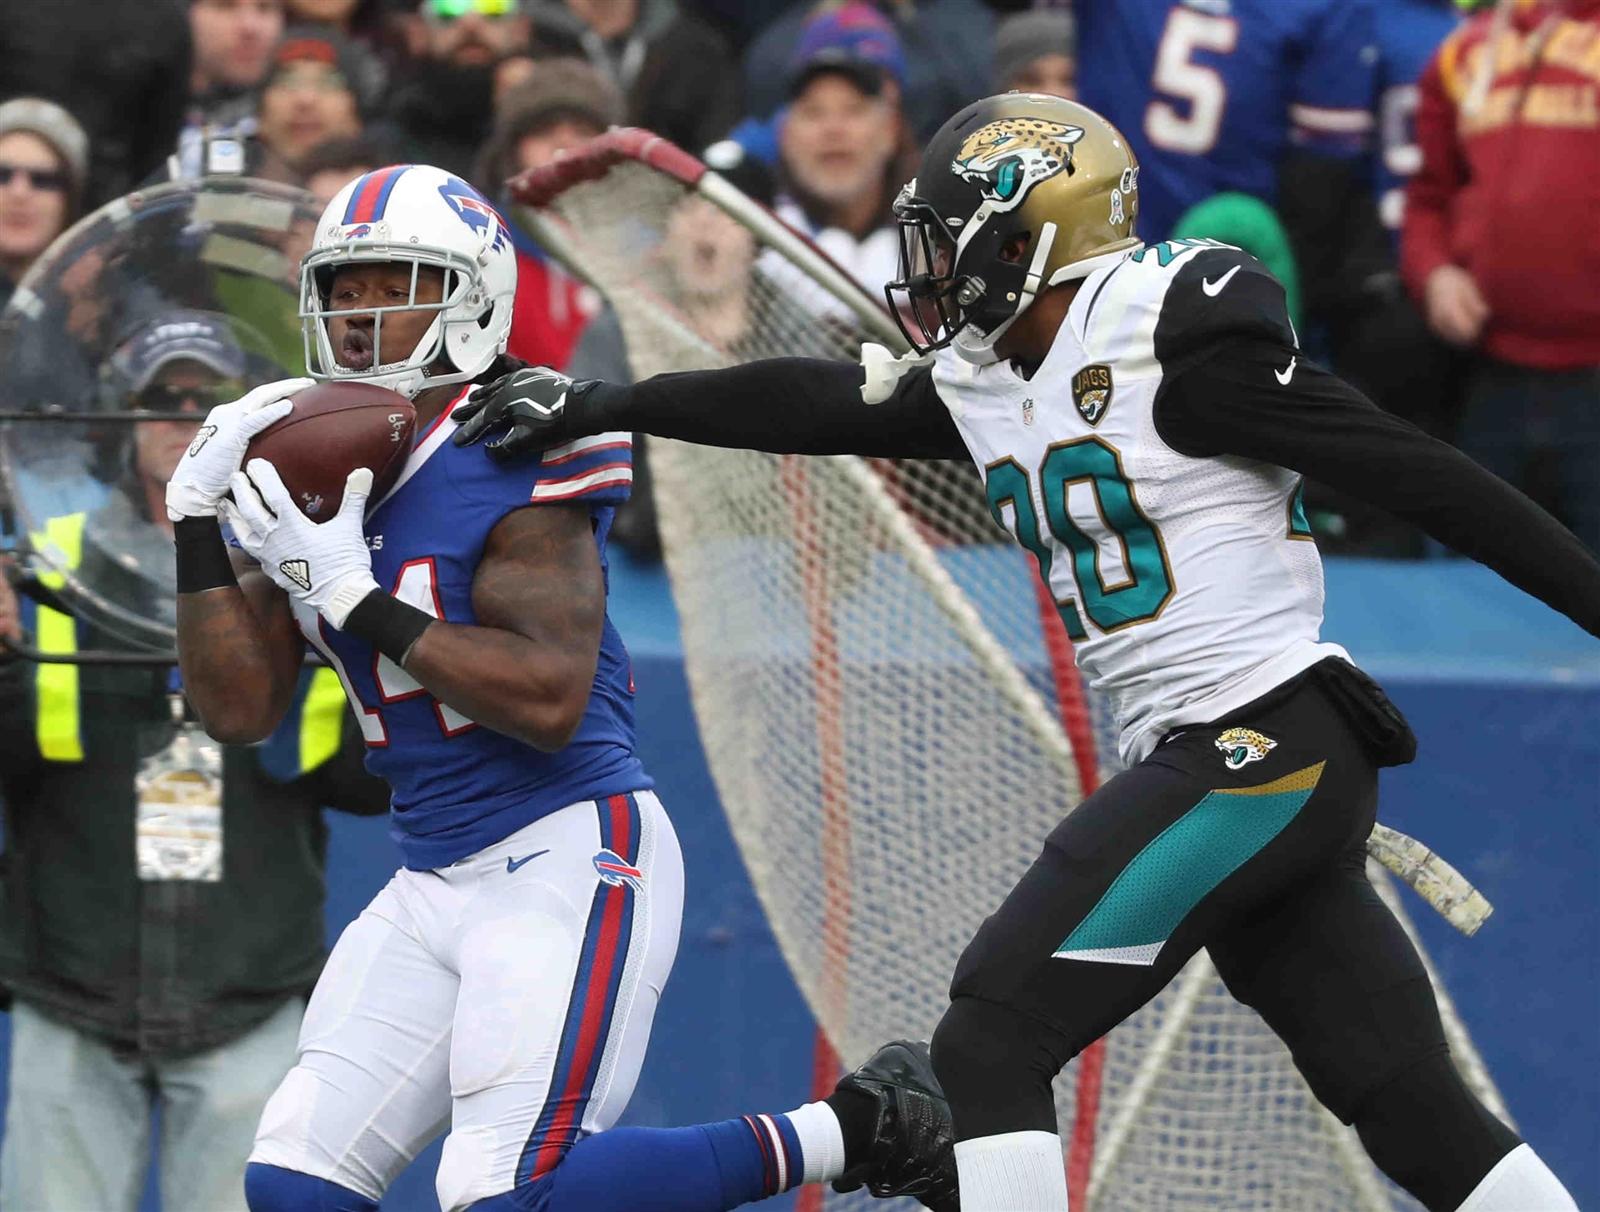 Buffalo Bills Sammy Watkins catches a pass in front of Jacksonville Jaguars Prince Amukamara during second quarter action at New Era Field on Sunday, Nov. 27, 2016. (Harry Scull Jr./Buffalo News)